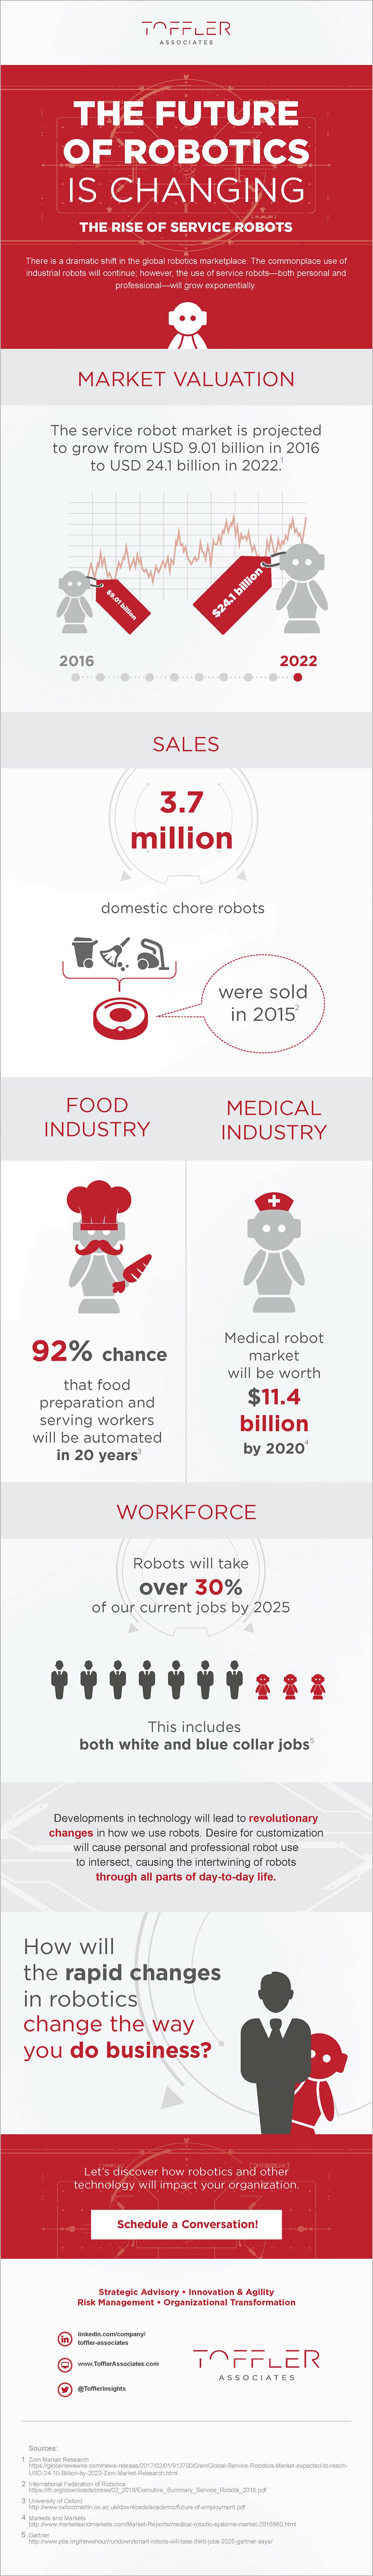 Robotics_Infographic_Image.png